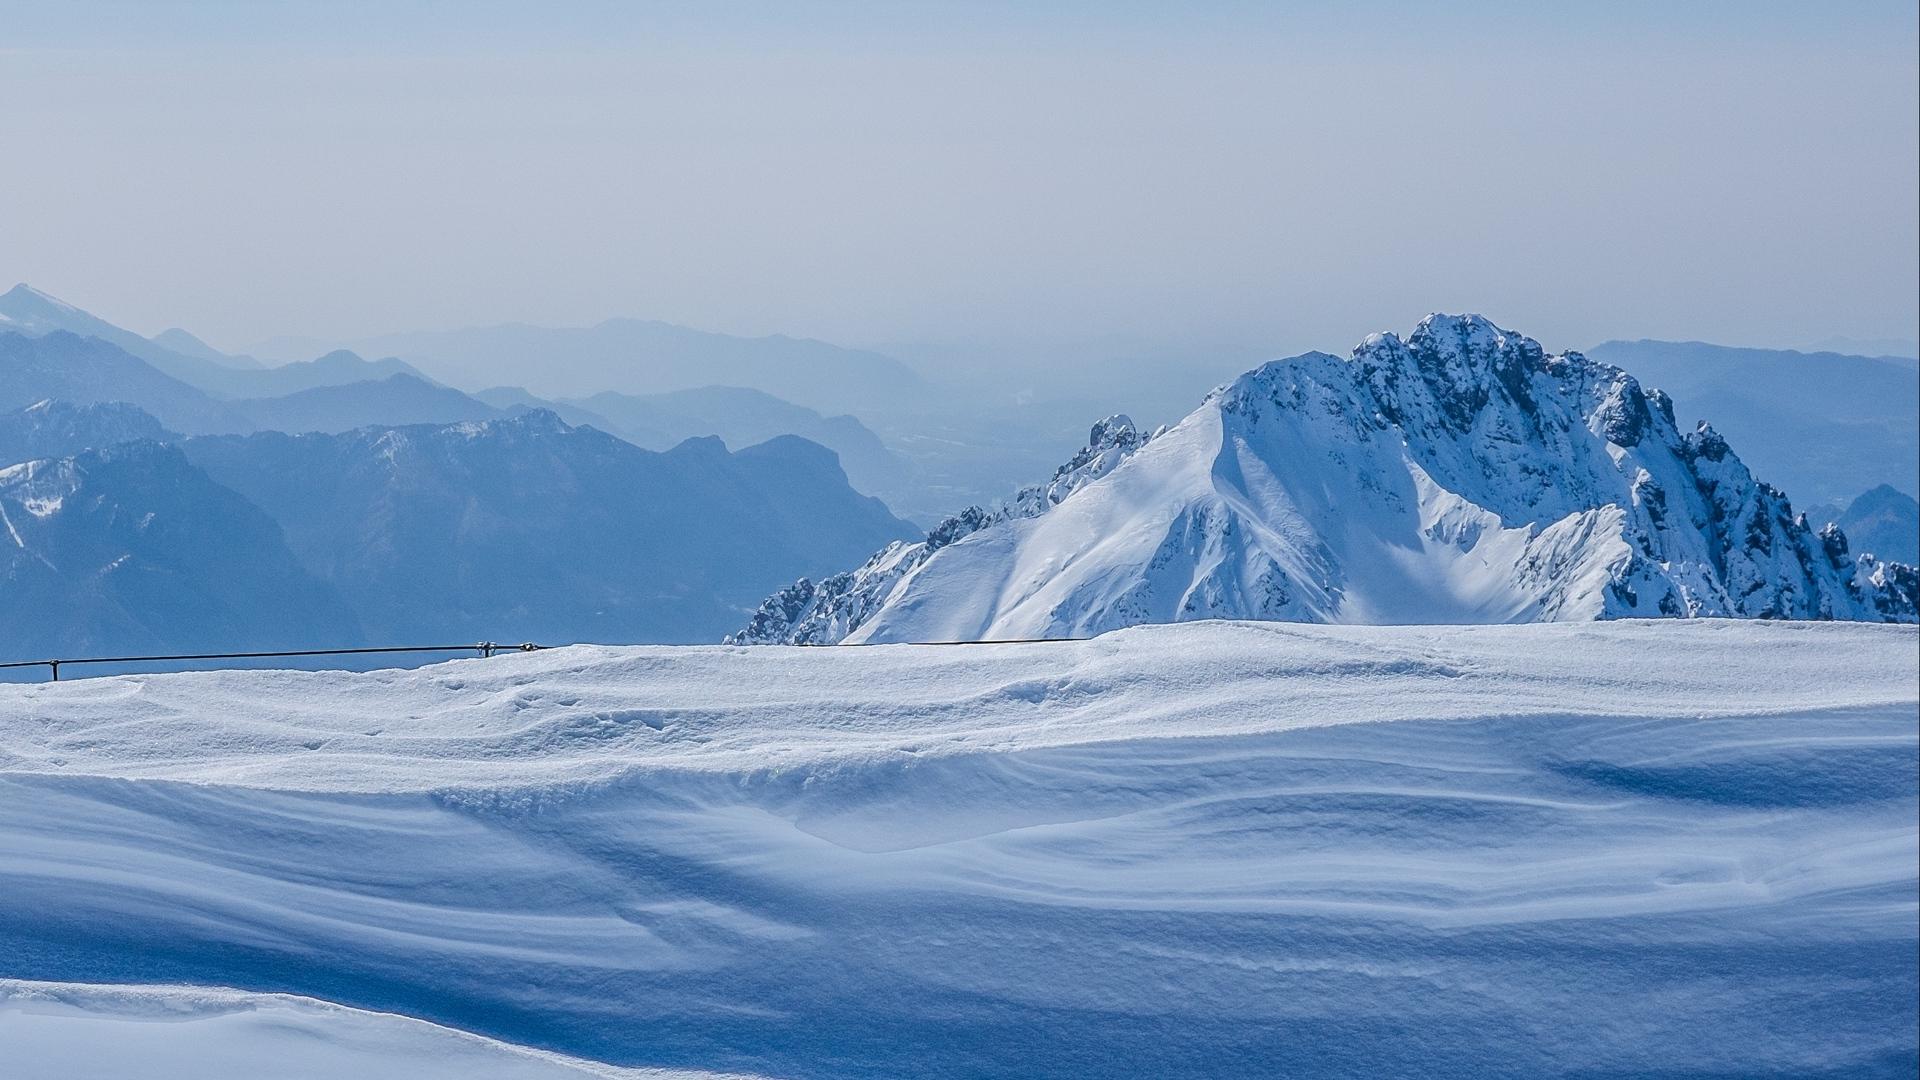 Sfondi Montagne Inverno La Neve Blu Montagna Innevata